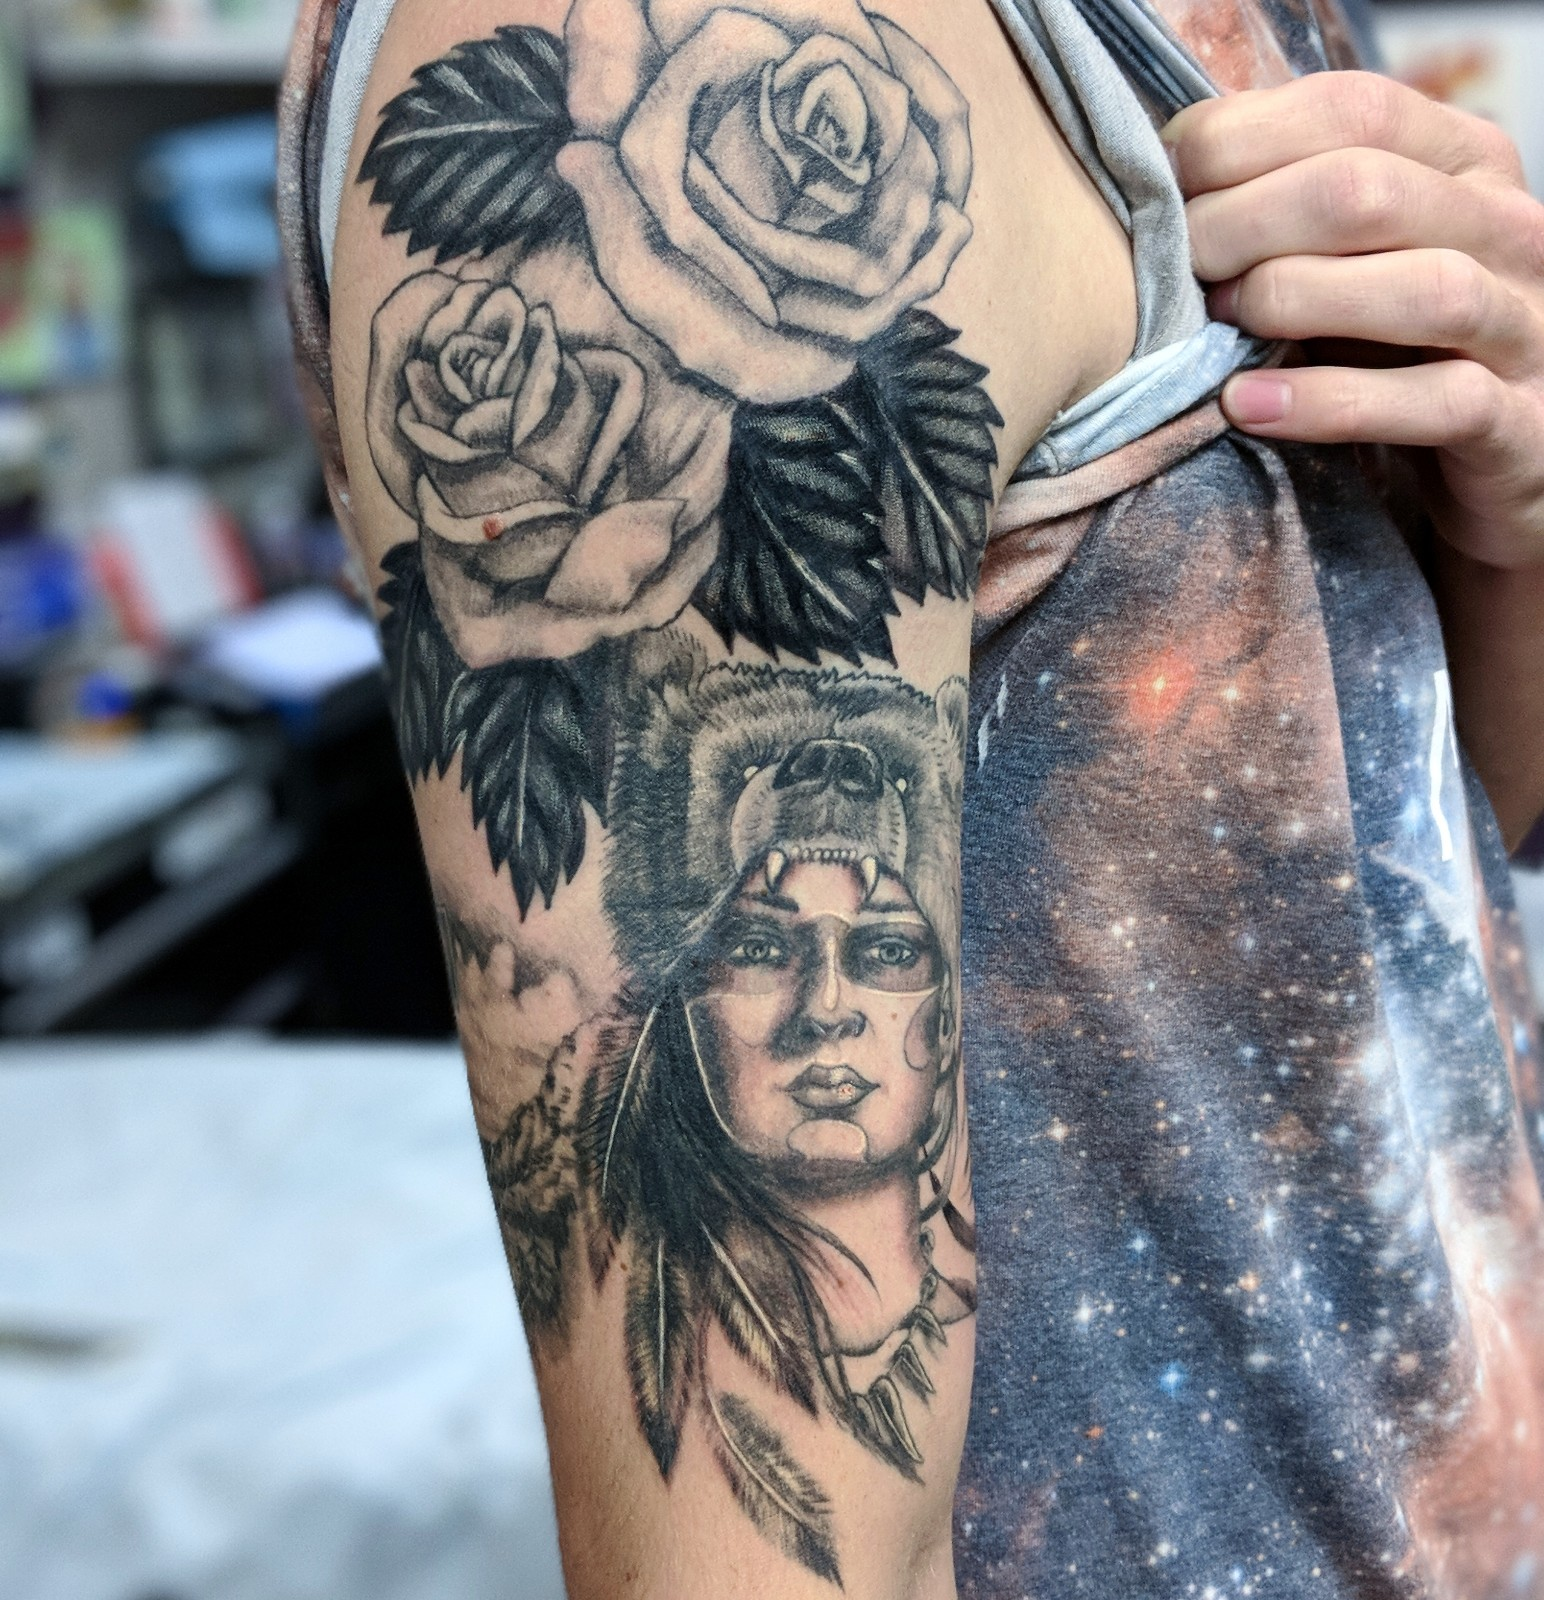 Covered Multiple tattoos